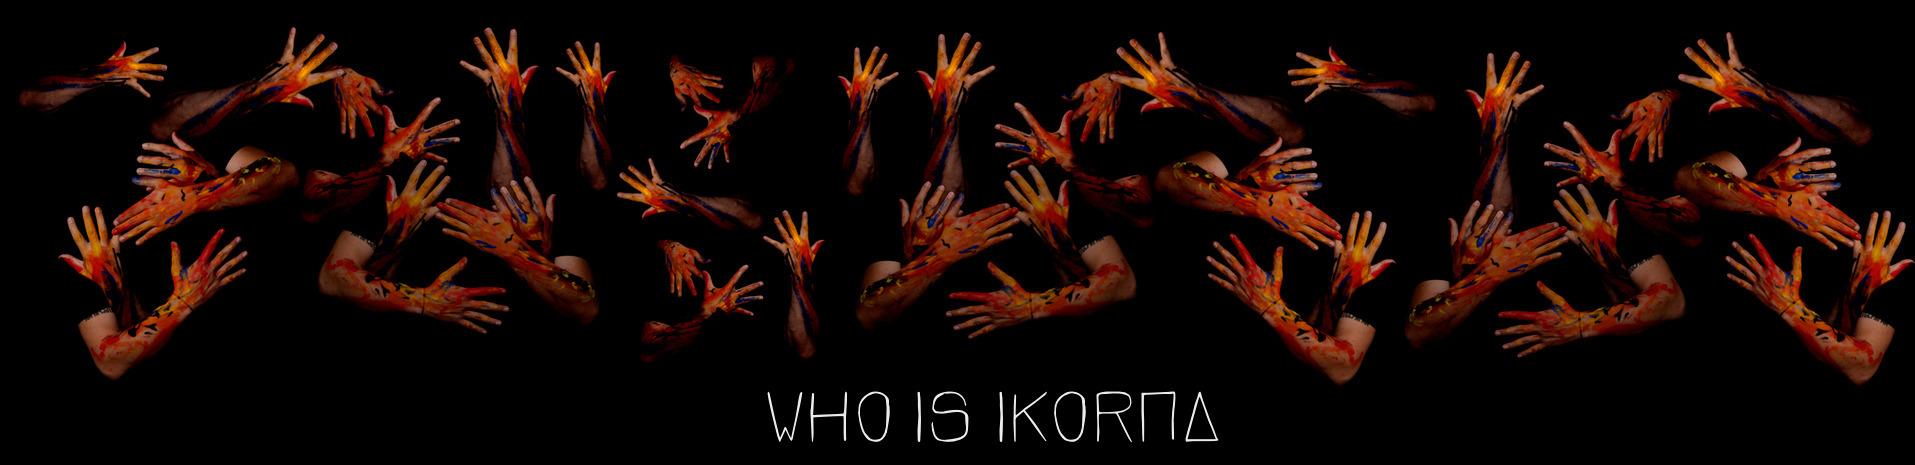 IKORMA (@ikorma) Cover Image